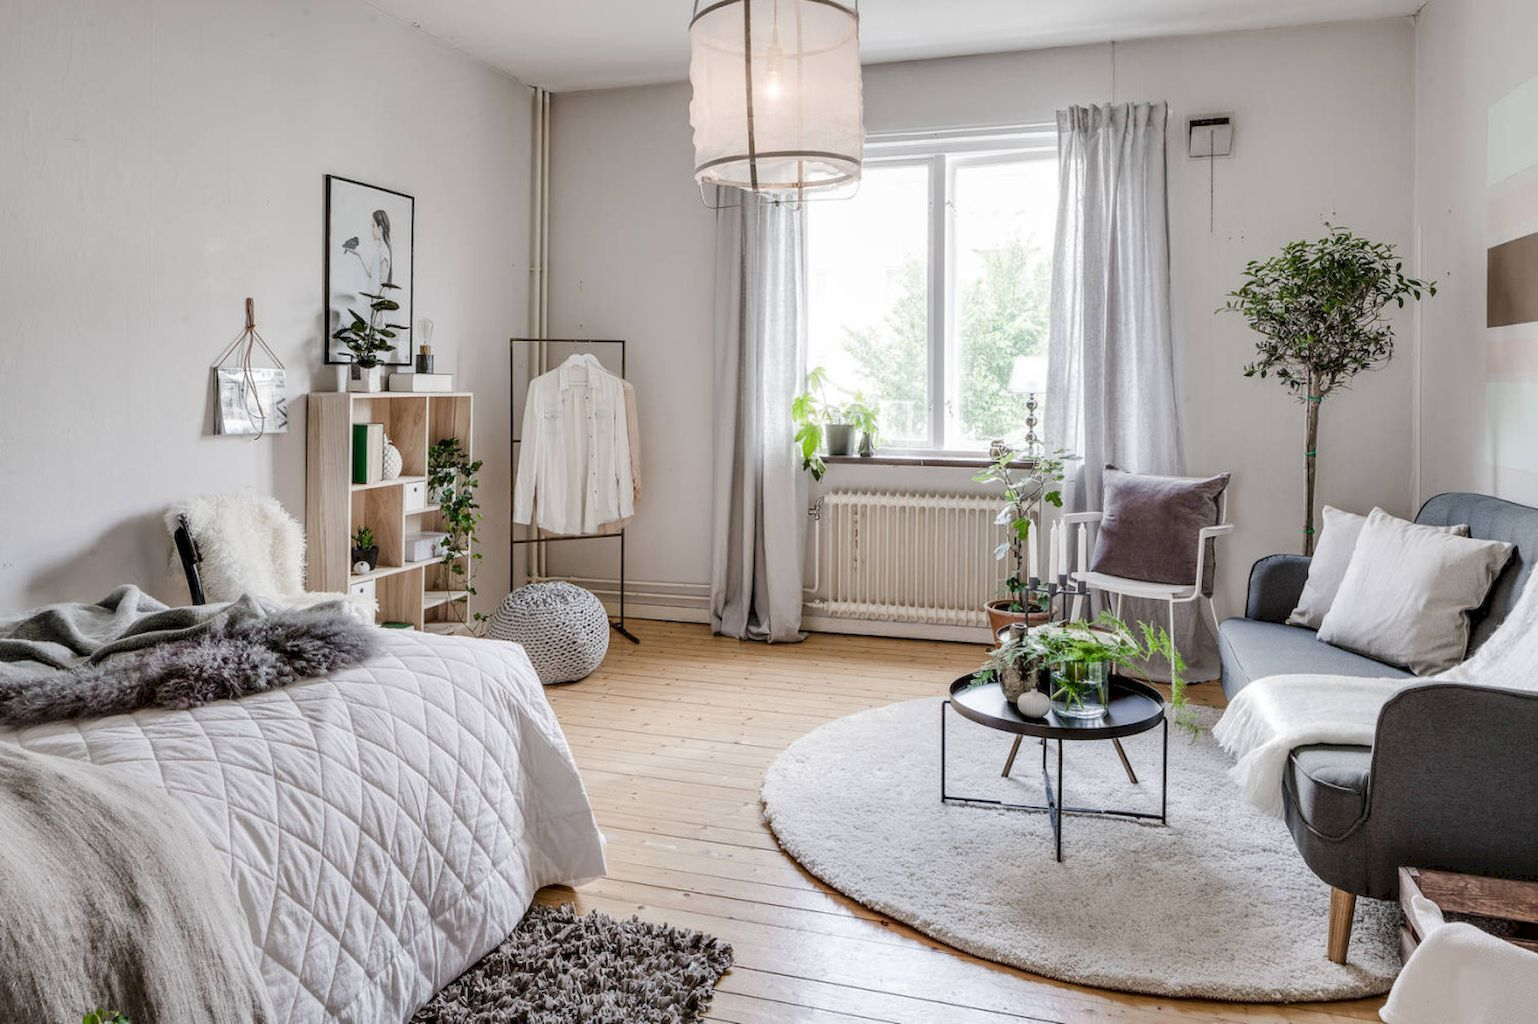 Adorable 60 Smart Studio Apartment Decorating Ideas